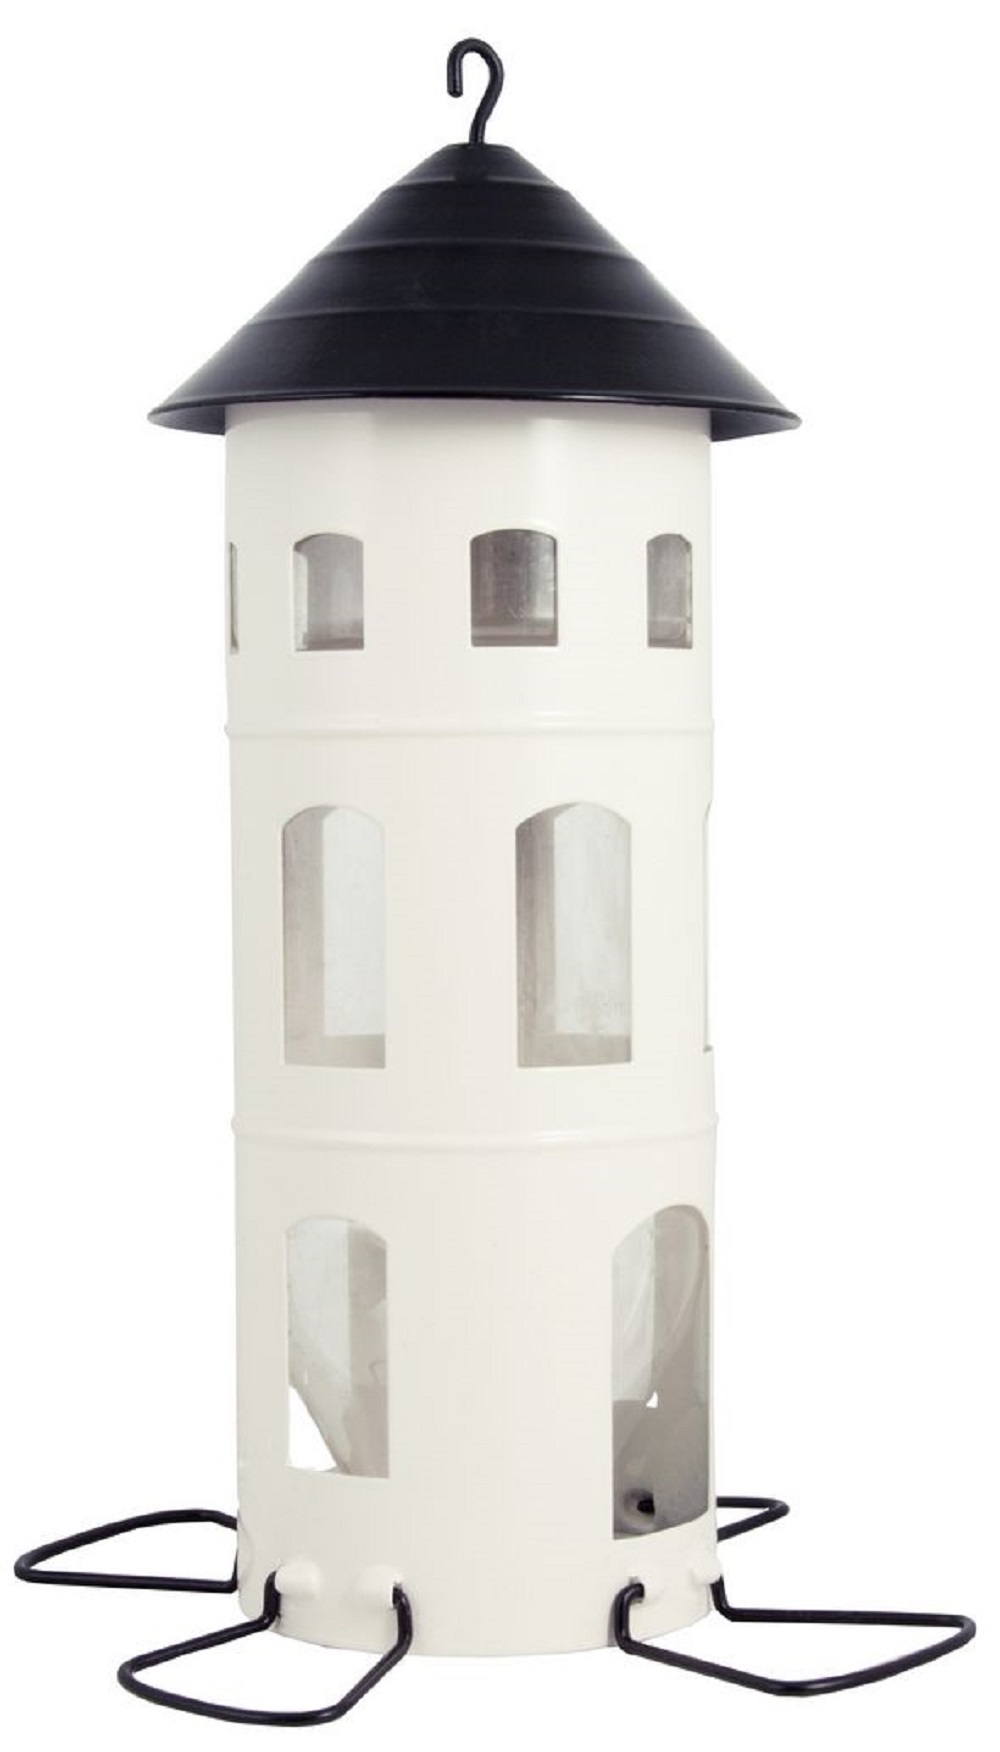 Кормушка Wildlife garden combi feeder Белый кормушка для птиц wildlife garden nuts wg321 black